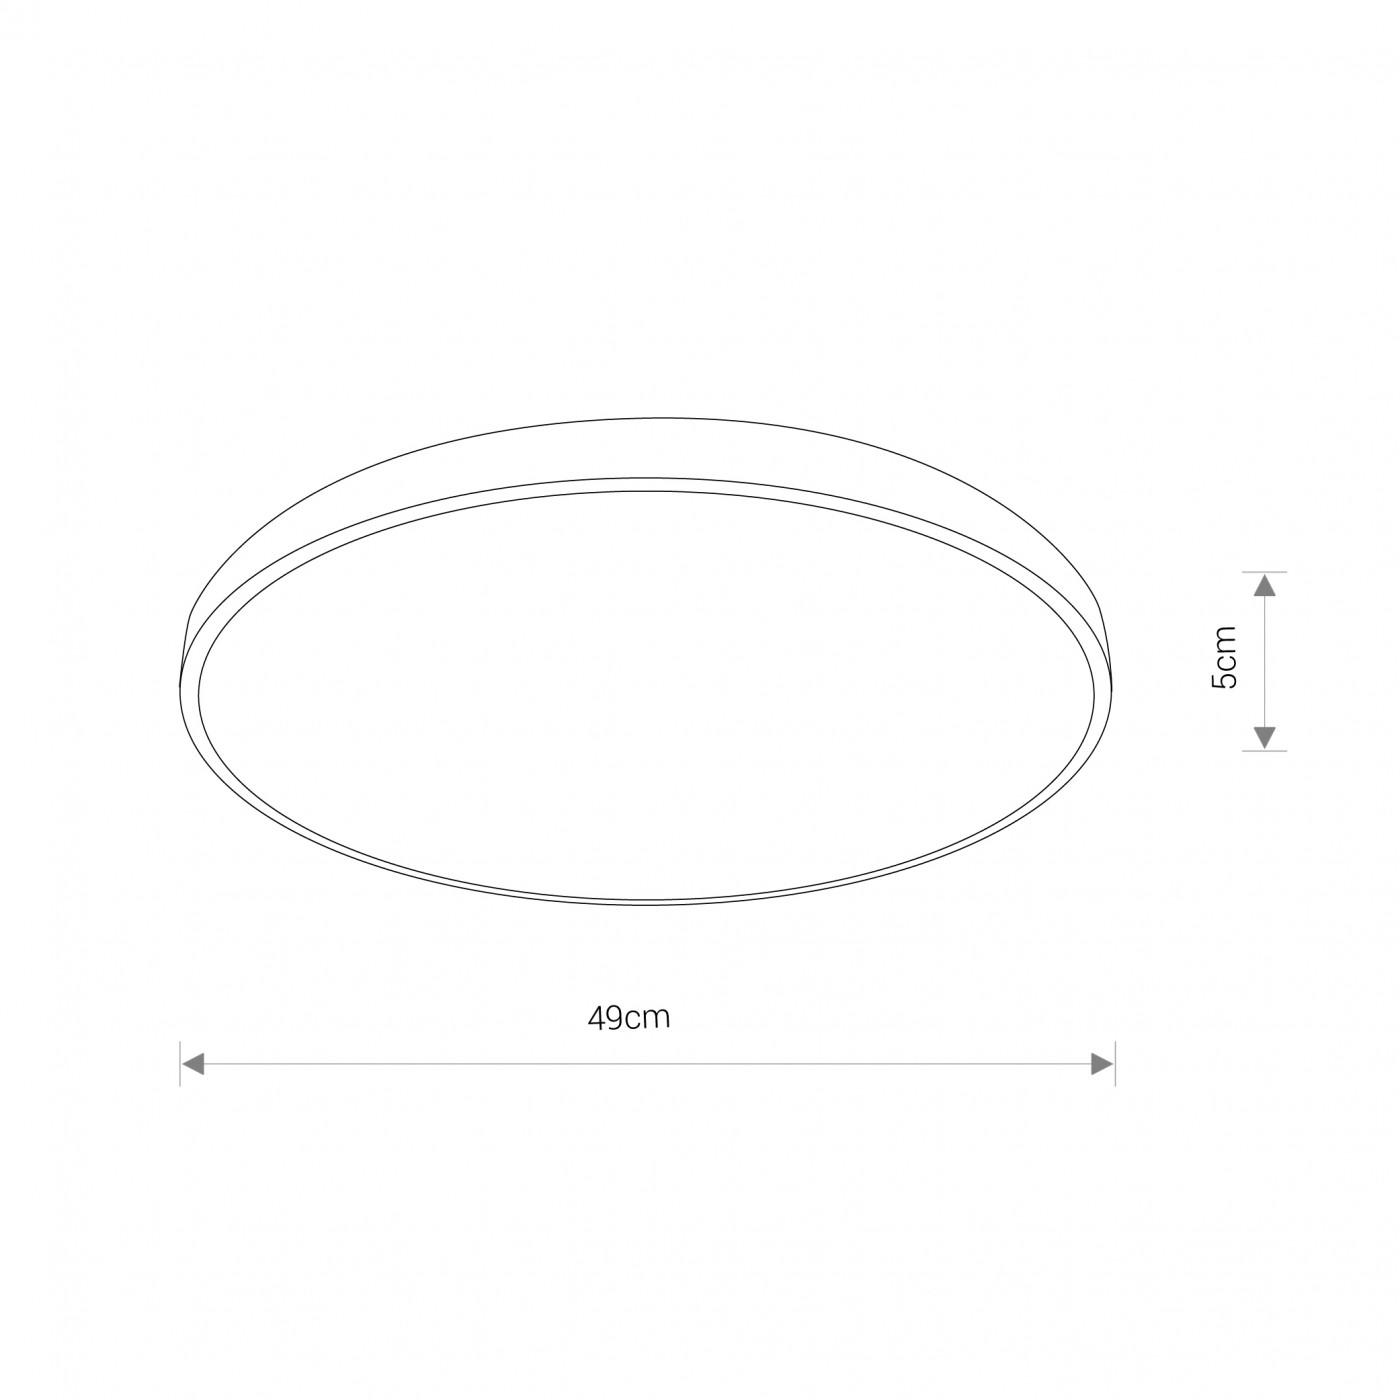 Nowodvorski TL-8187 Agnes Round LED víz-védett mennyezeti lámpa